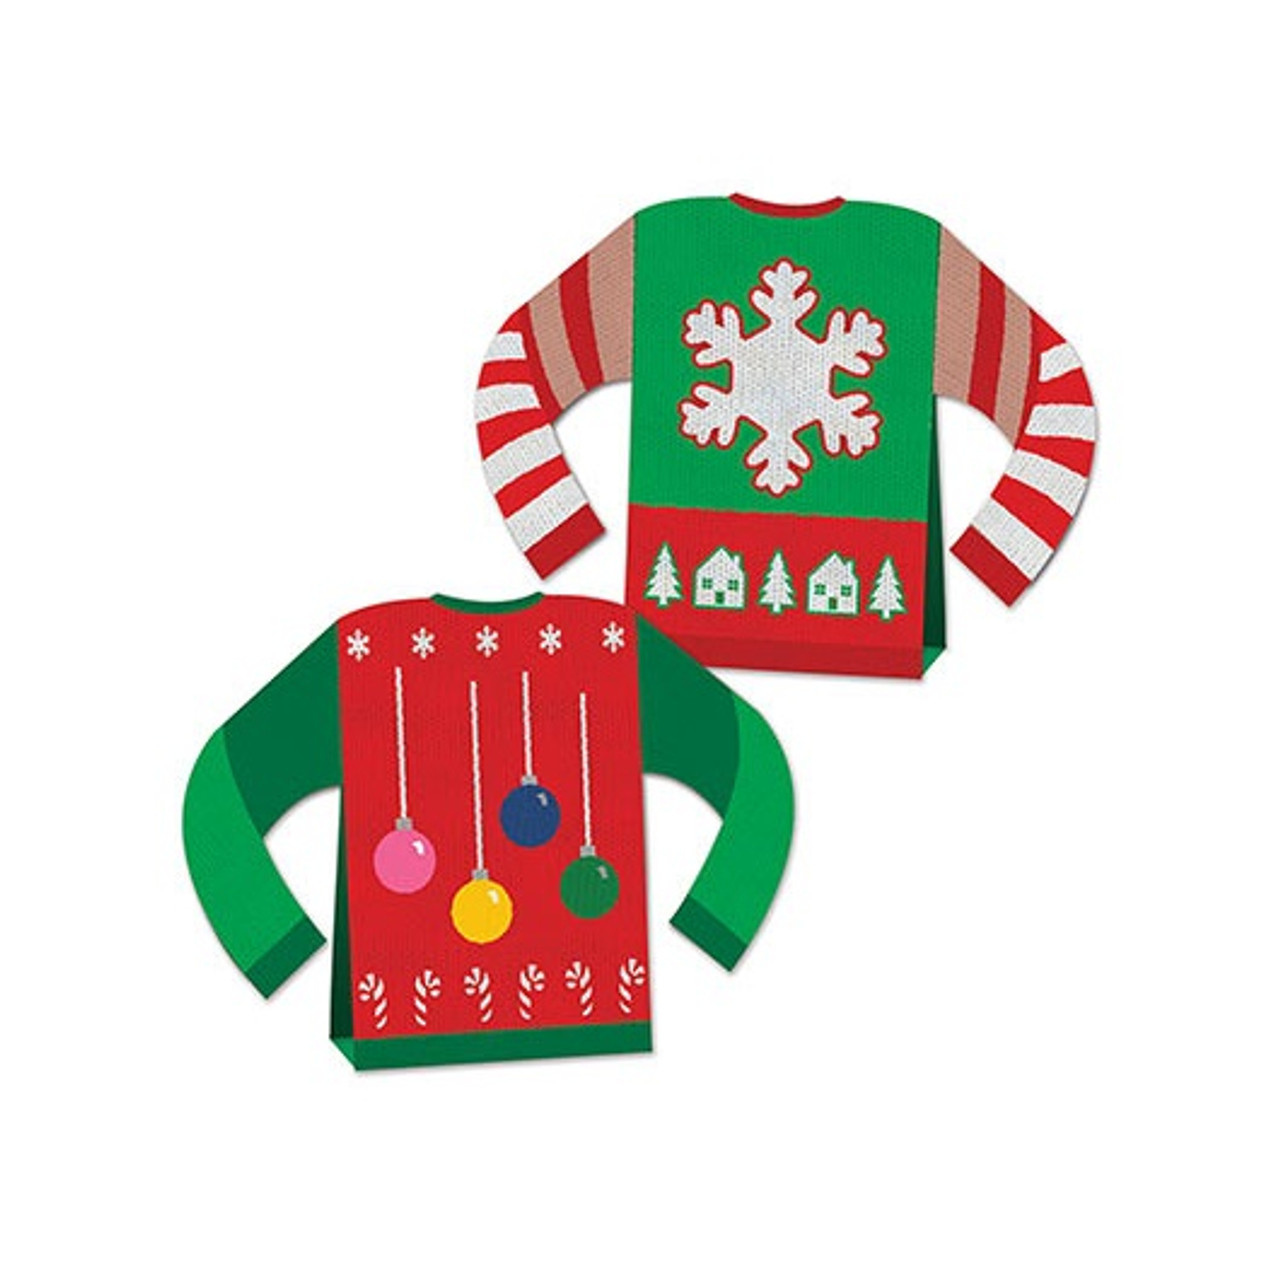 sw seasonal pd shop felt plaid sweaters kits decorations sweater decor products bucilla ornament ugly